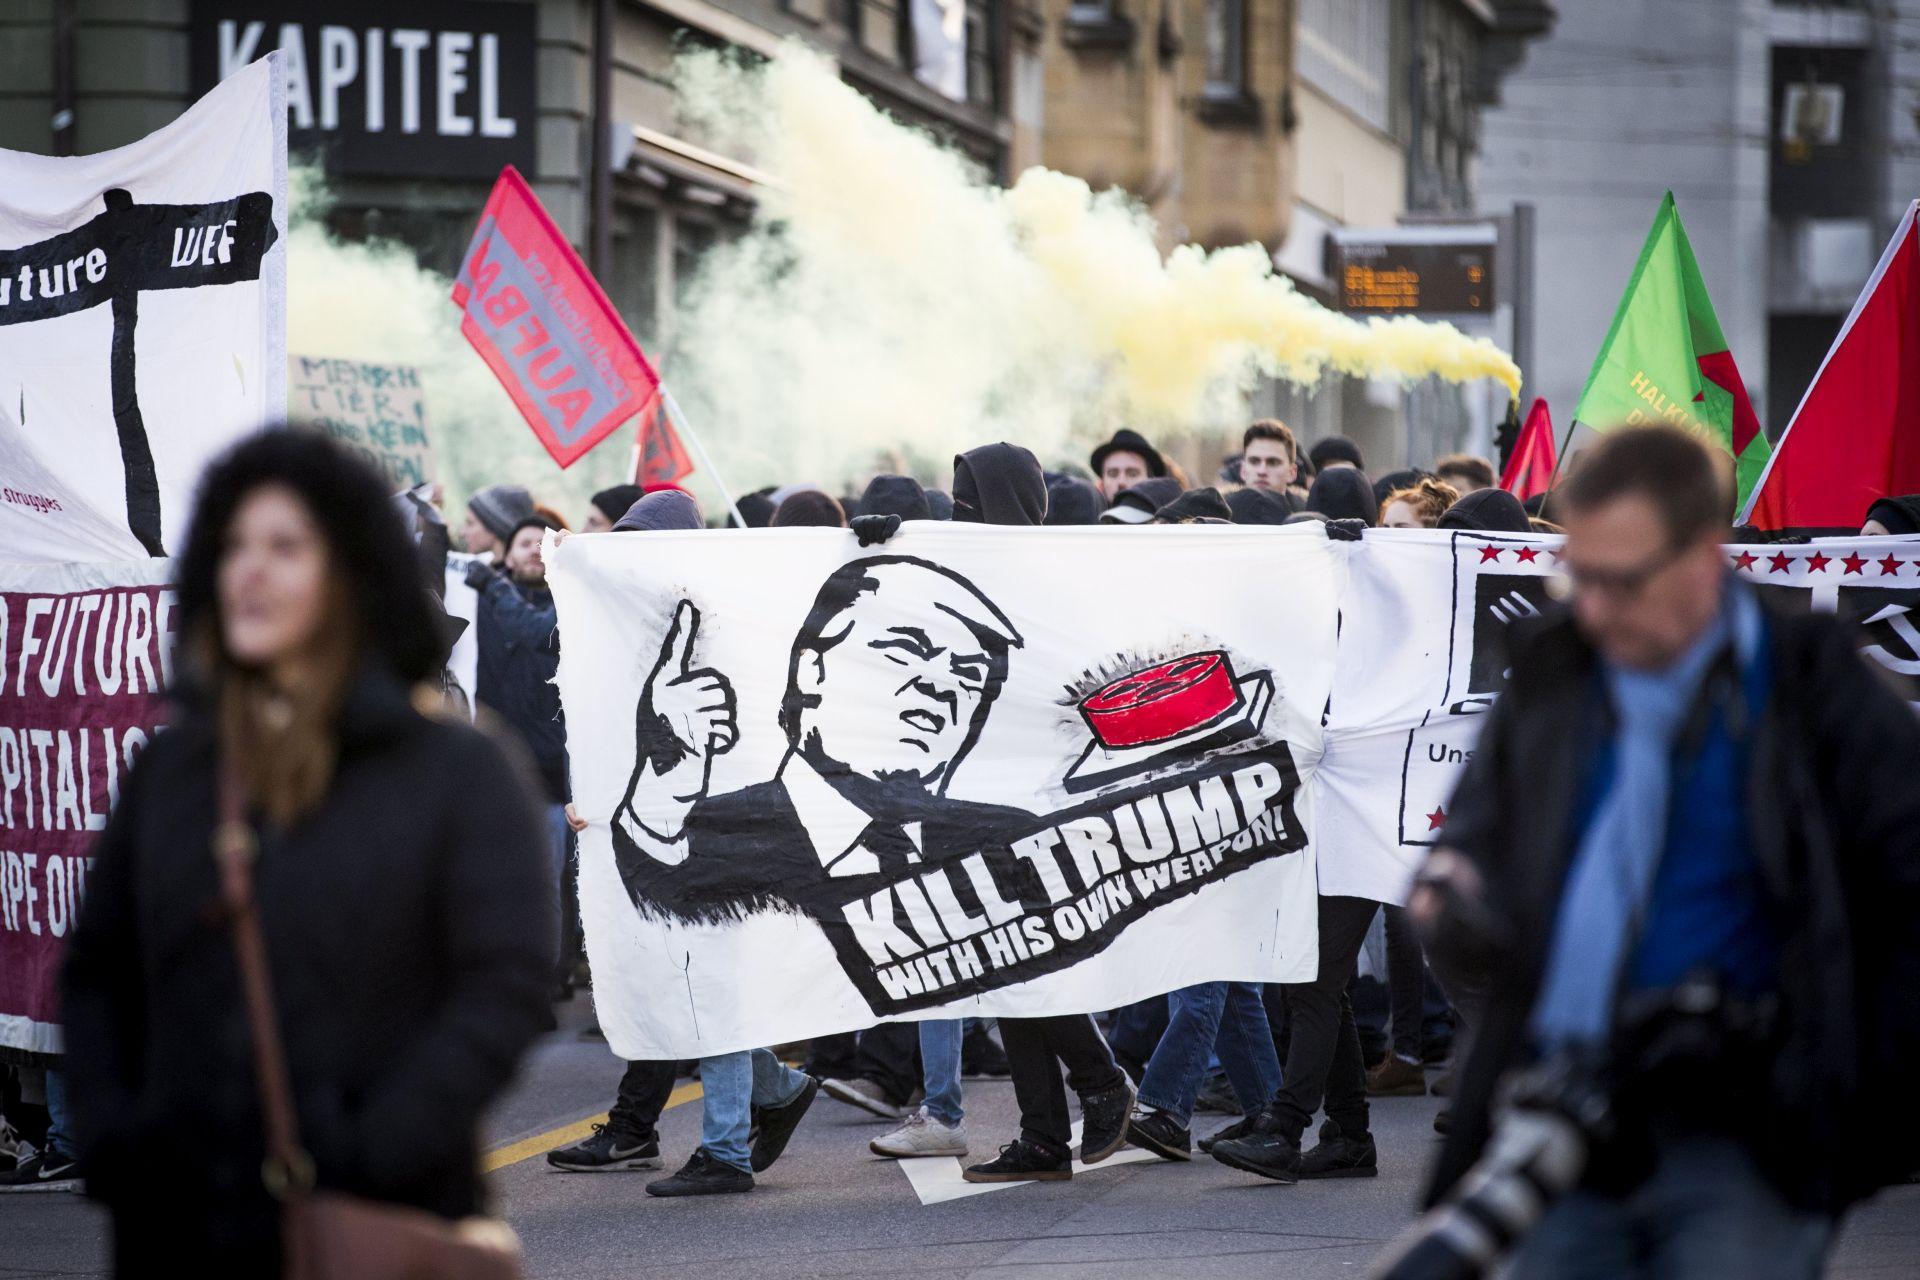 Upitan Trumpov dolazak u Davos